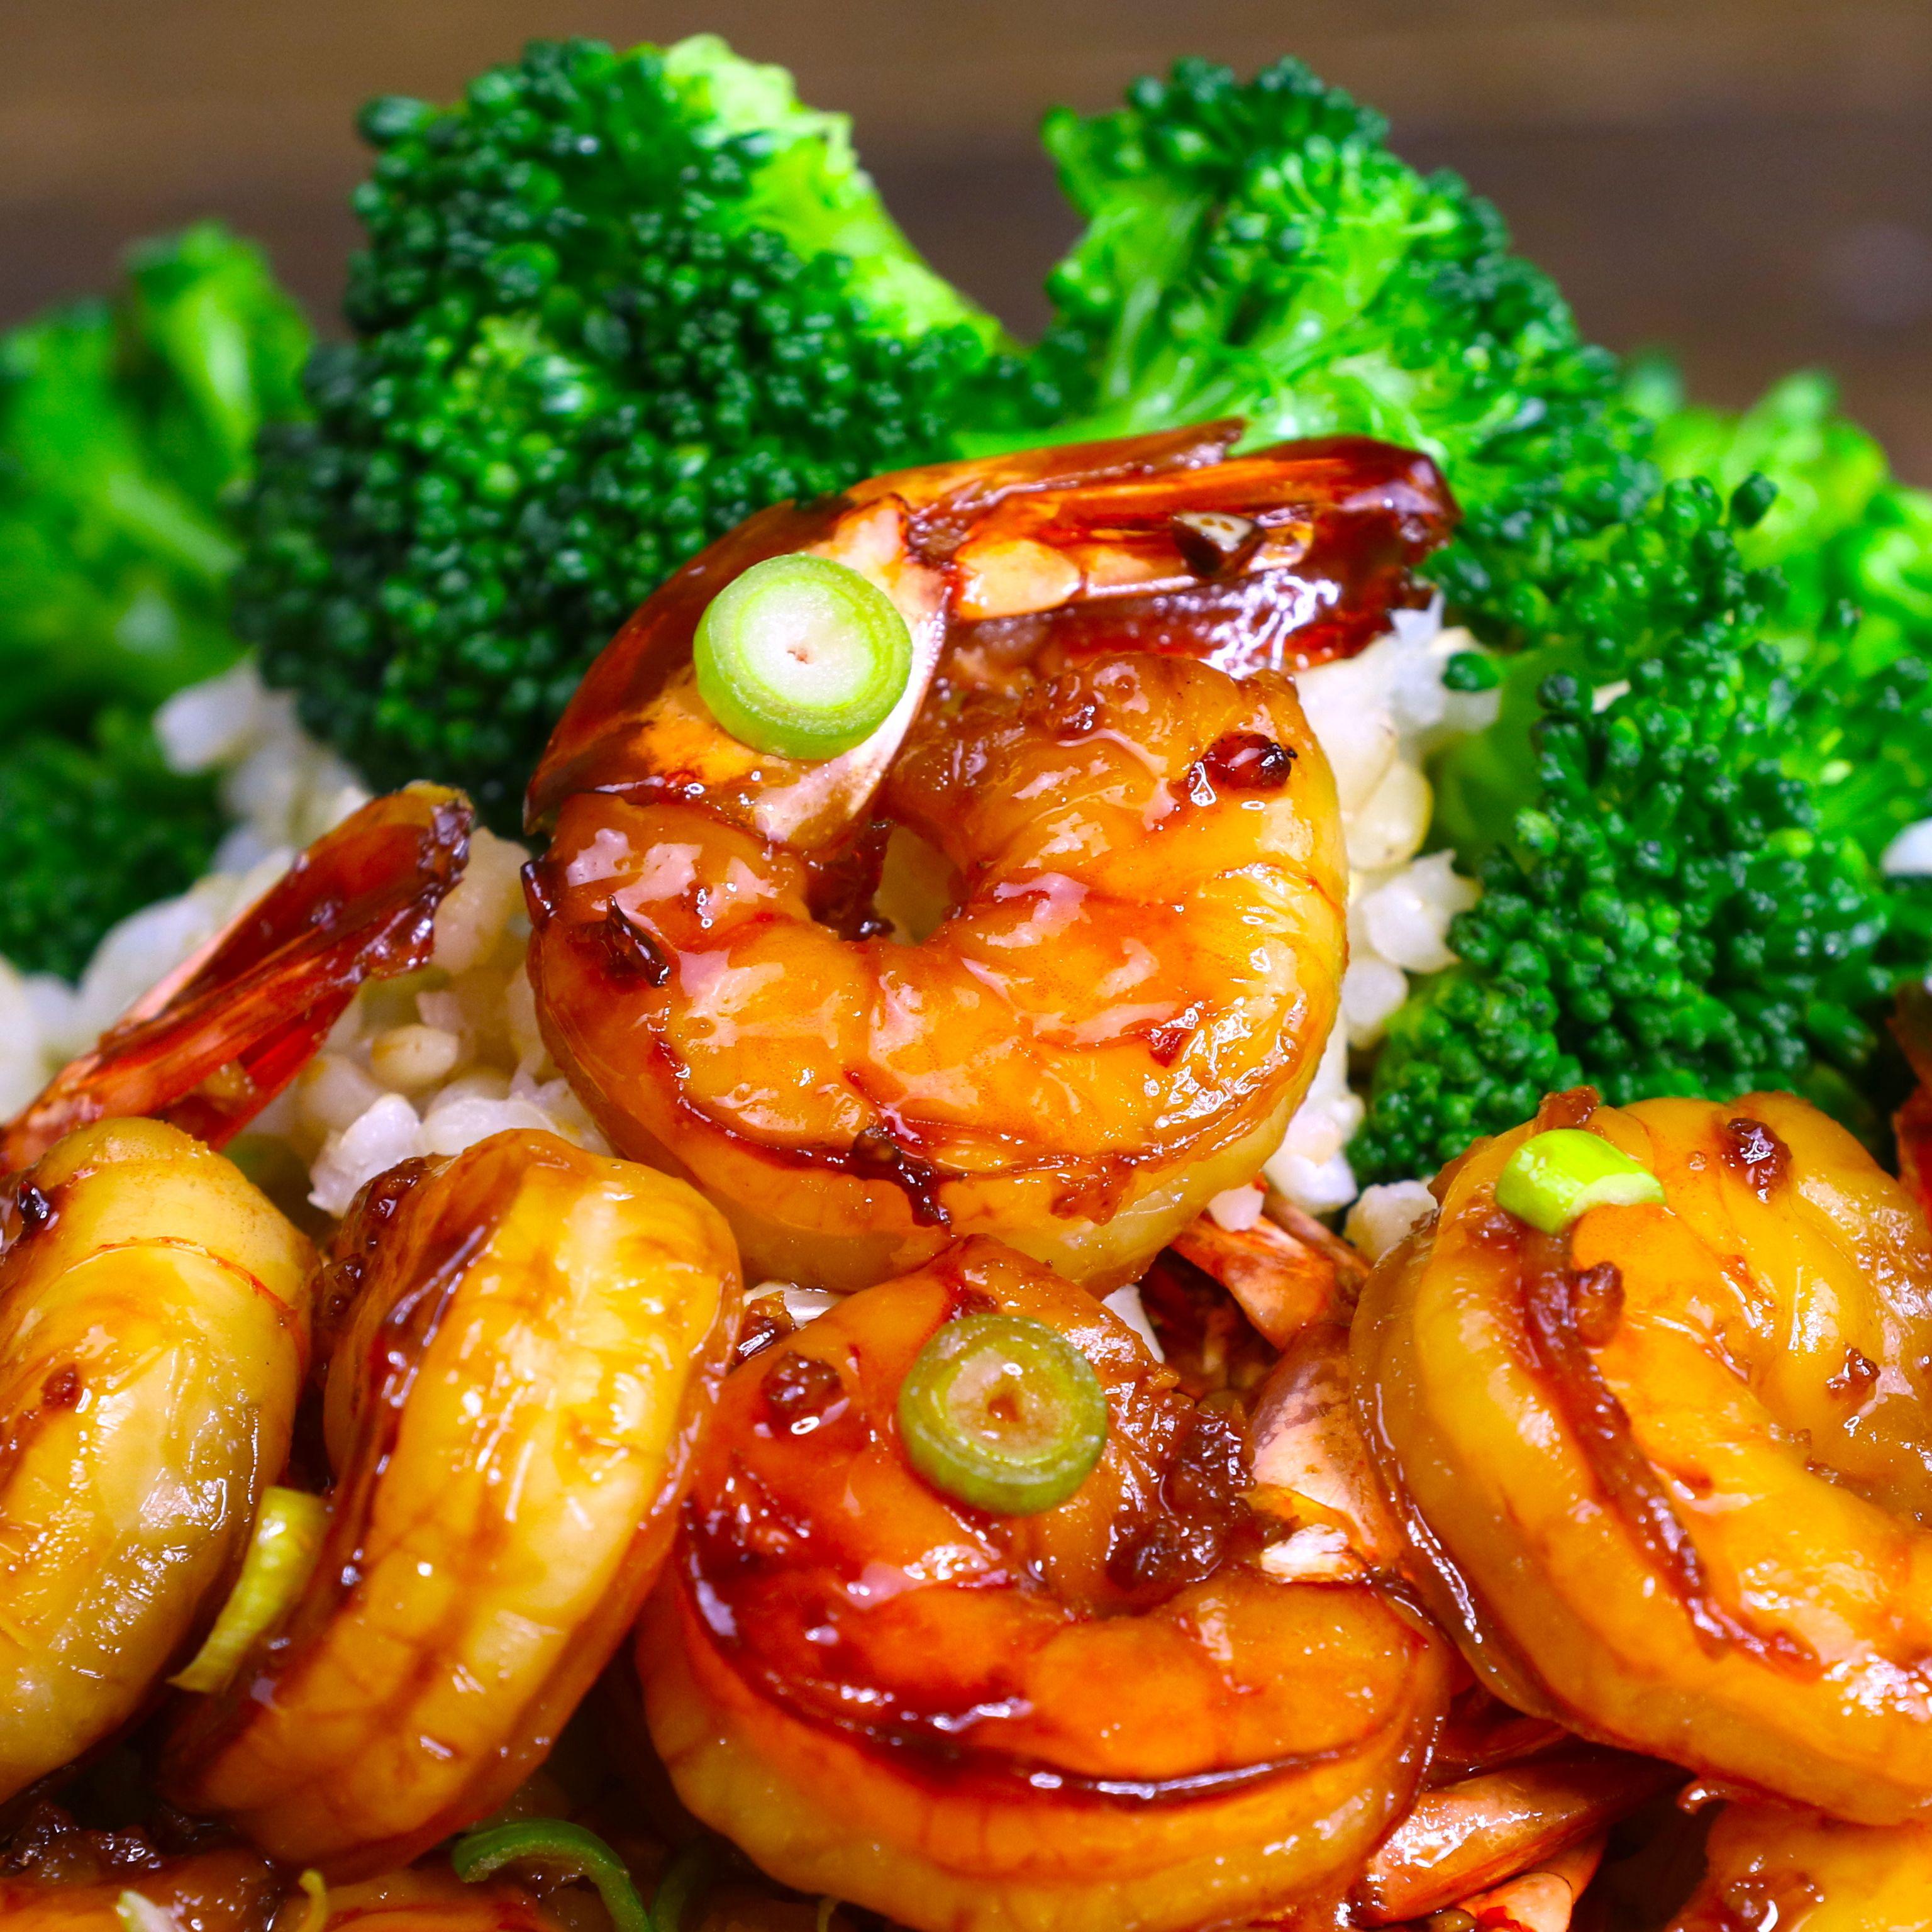 Honey Garlic Shrimp {Easy 15 Minute Recipe} - TipB